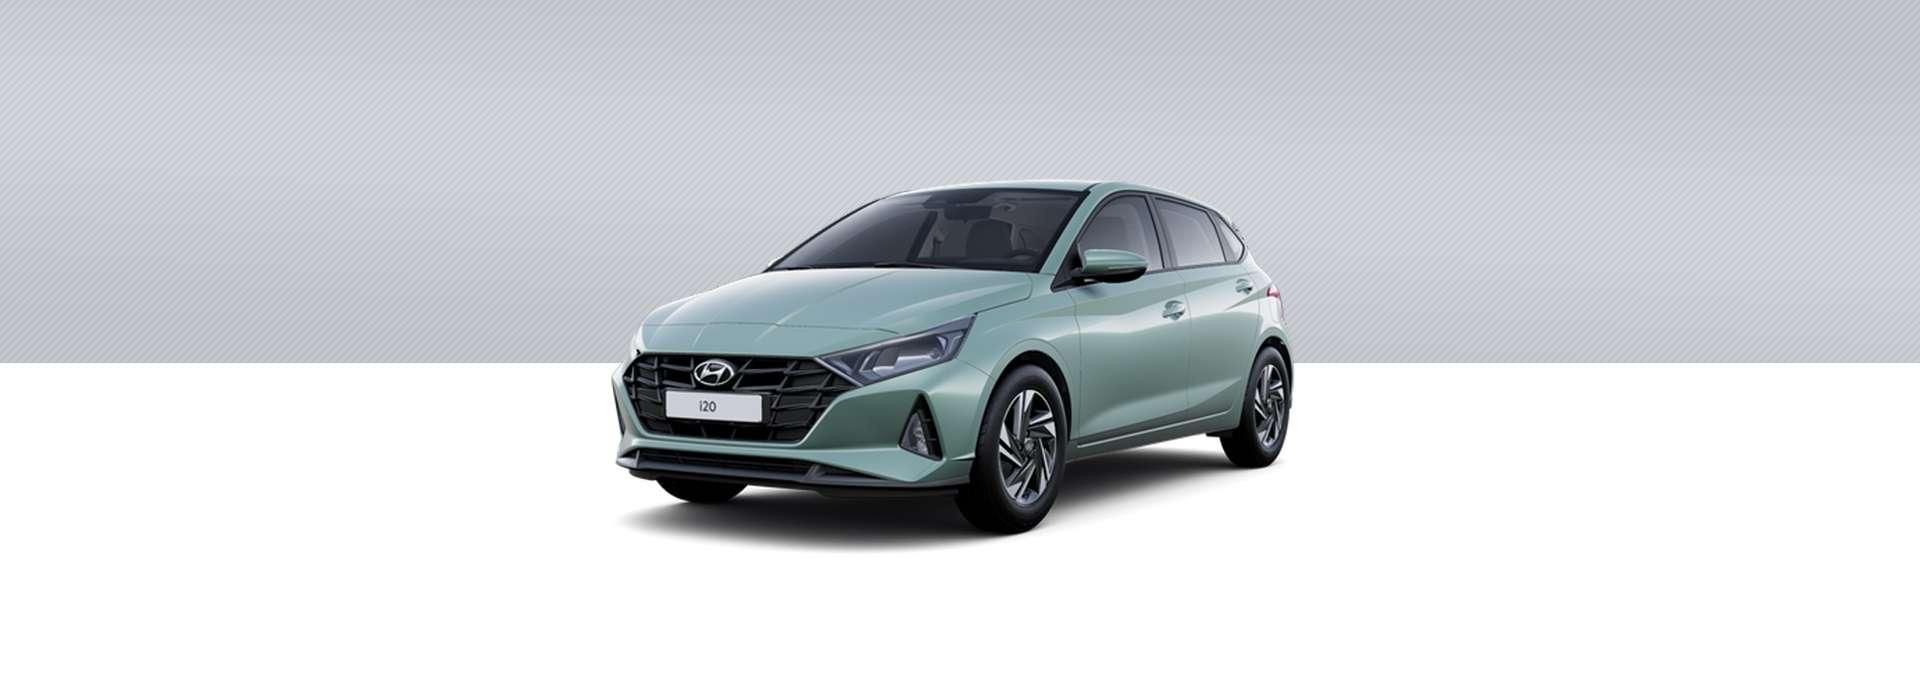 Hyundai Nuevo i20 Híbrido 48V